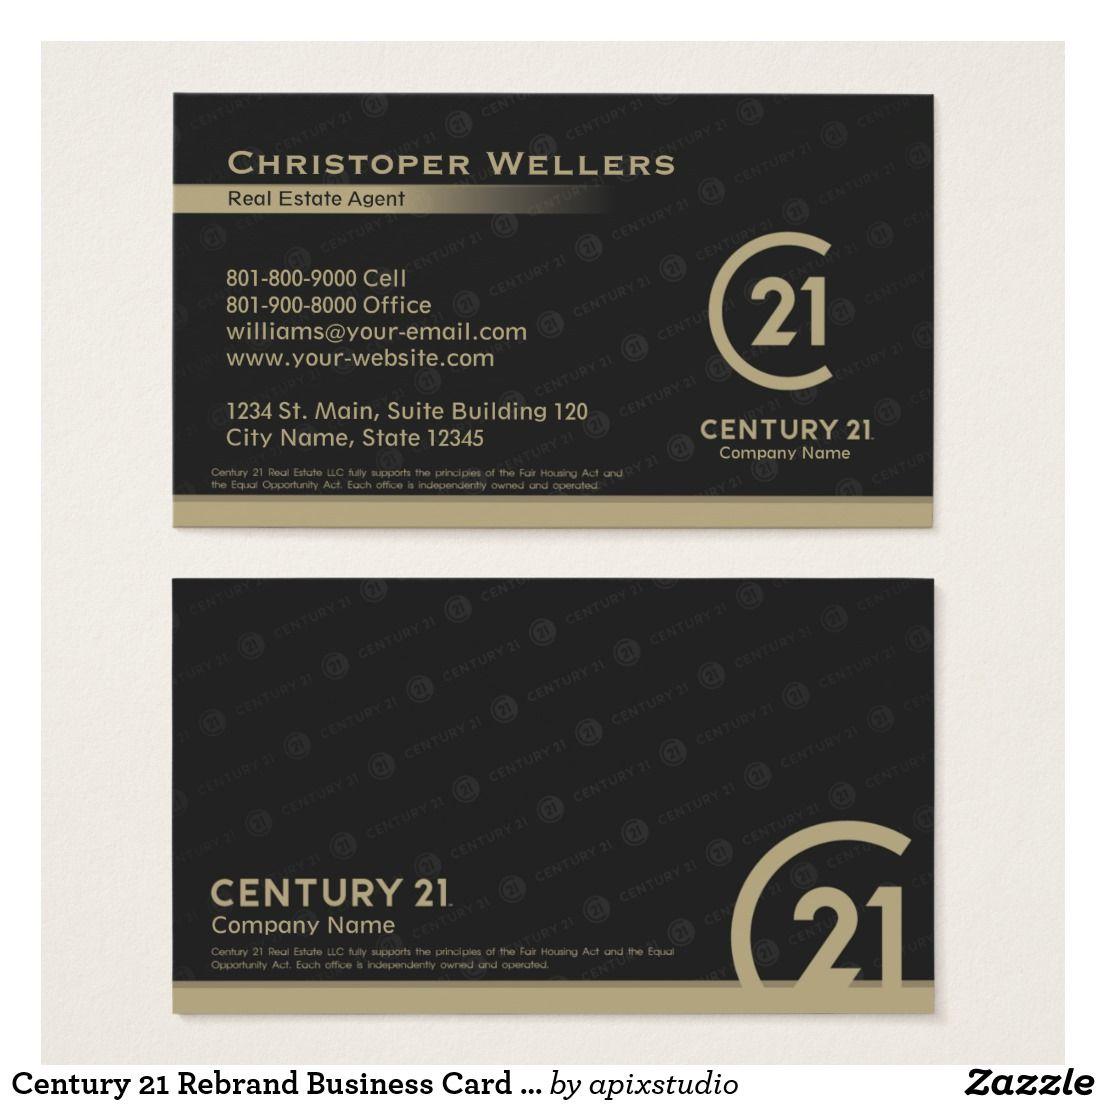 Century 21 Rebrand Business Card Design Zazzle Com Business Card Design Card Design Business Cards